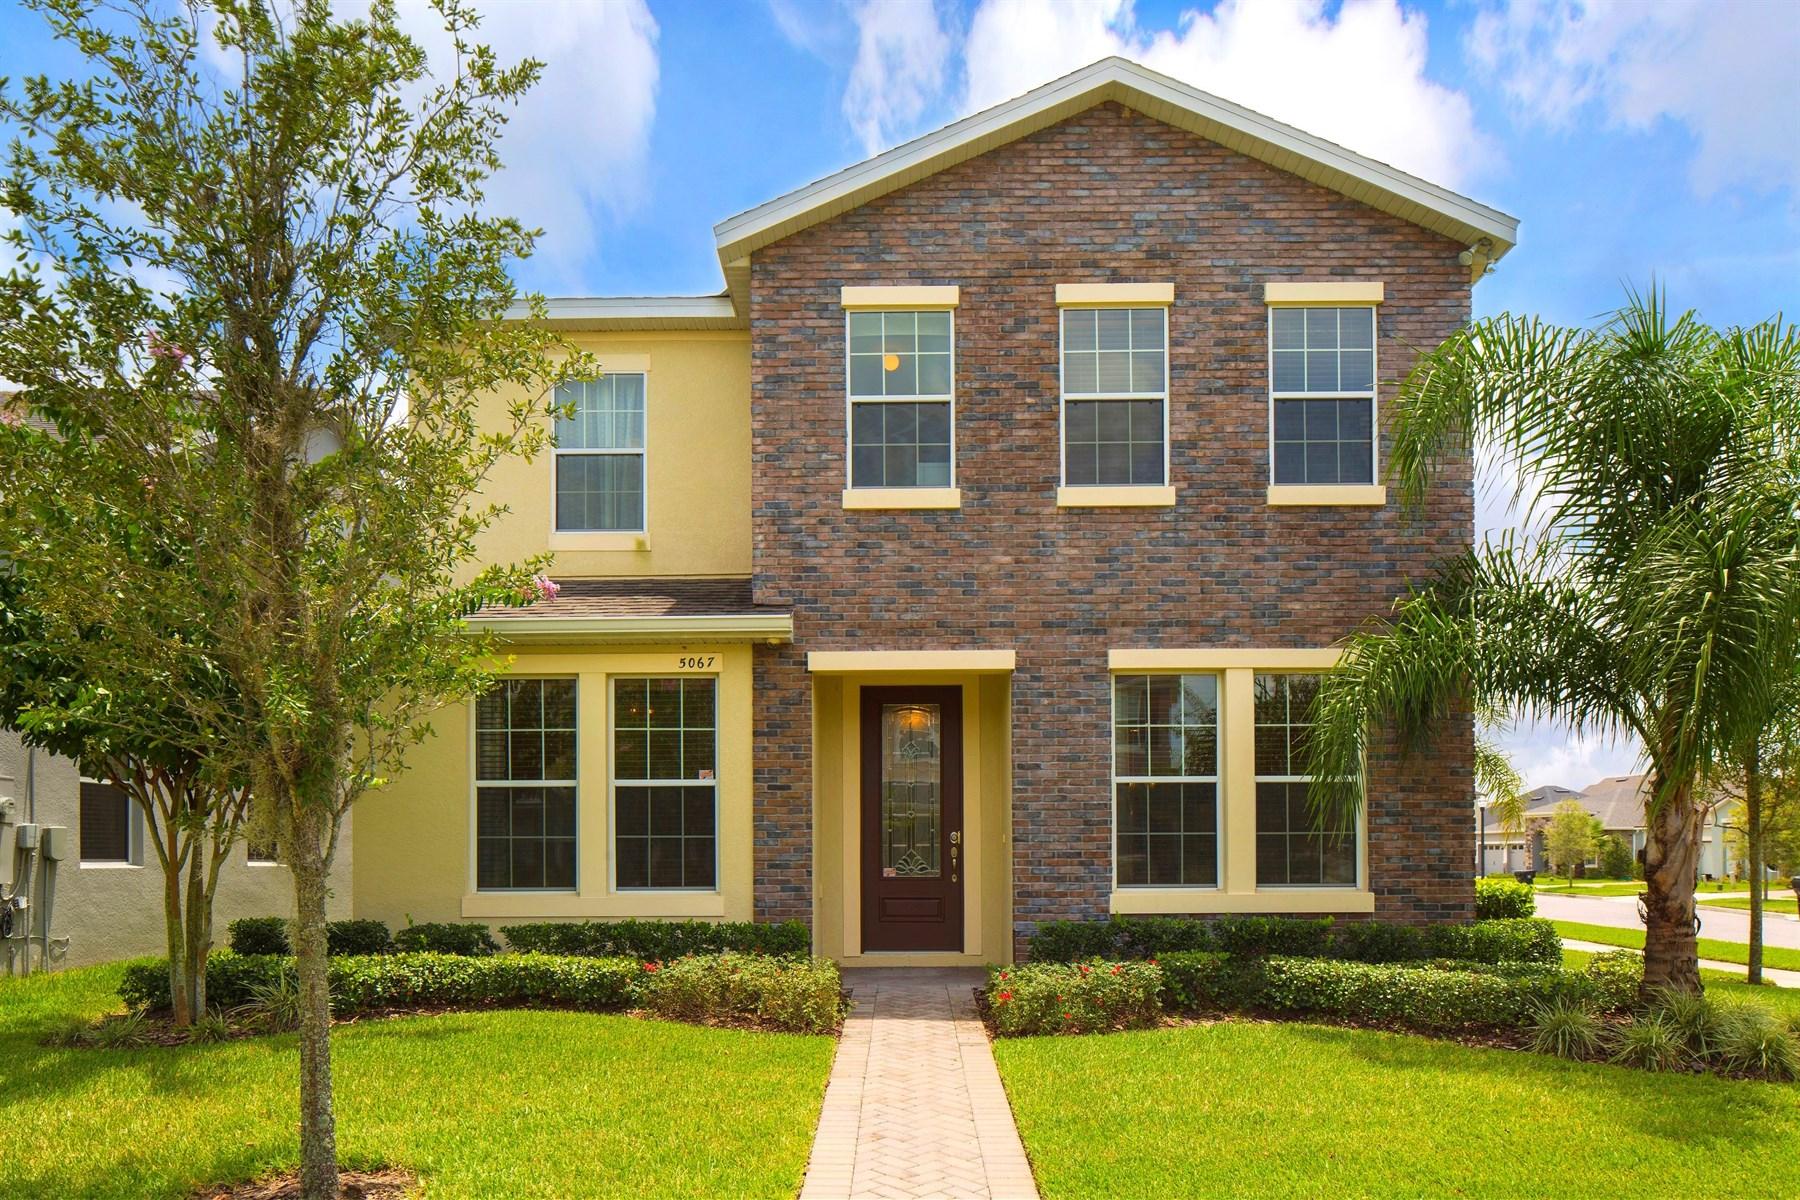 独户住宅 为 销售 在 ORLANDO 5067 Giant Bulrush Ln Orlando, 佛罗里达州 32811 美国